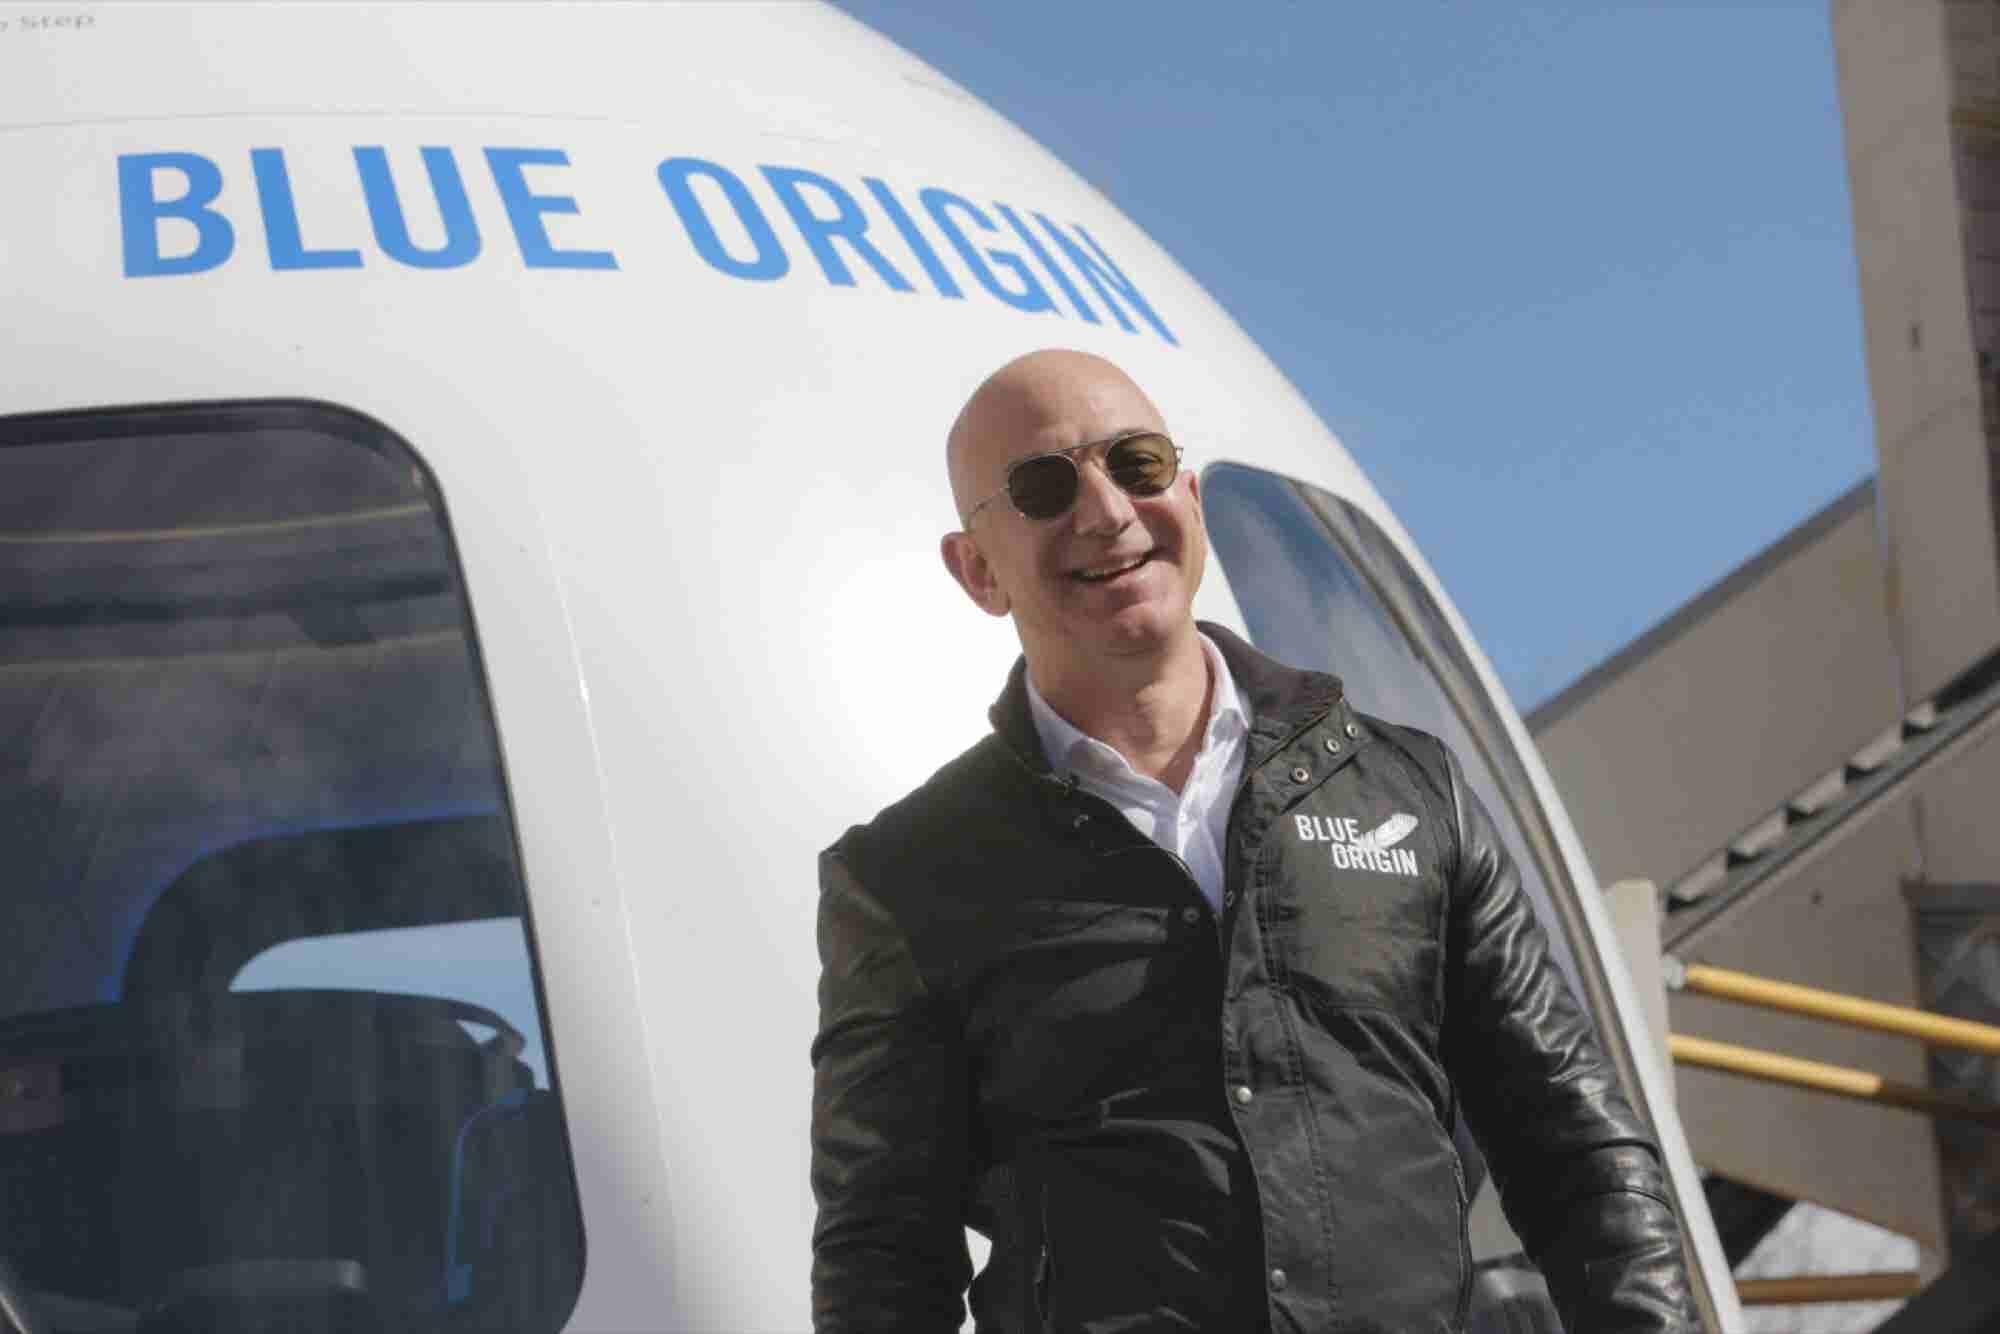 Jeff Bezos Will Sell $1 Billion of Amazon Stock a Year to Fund Blue Origin